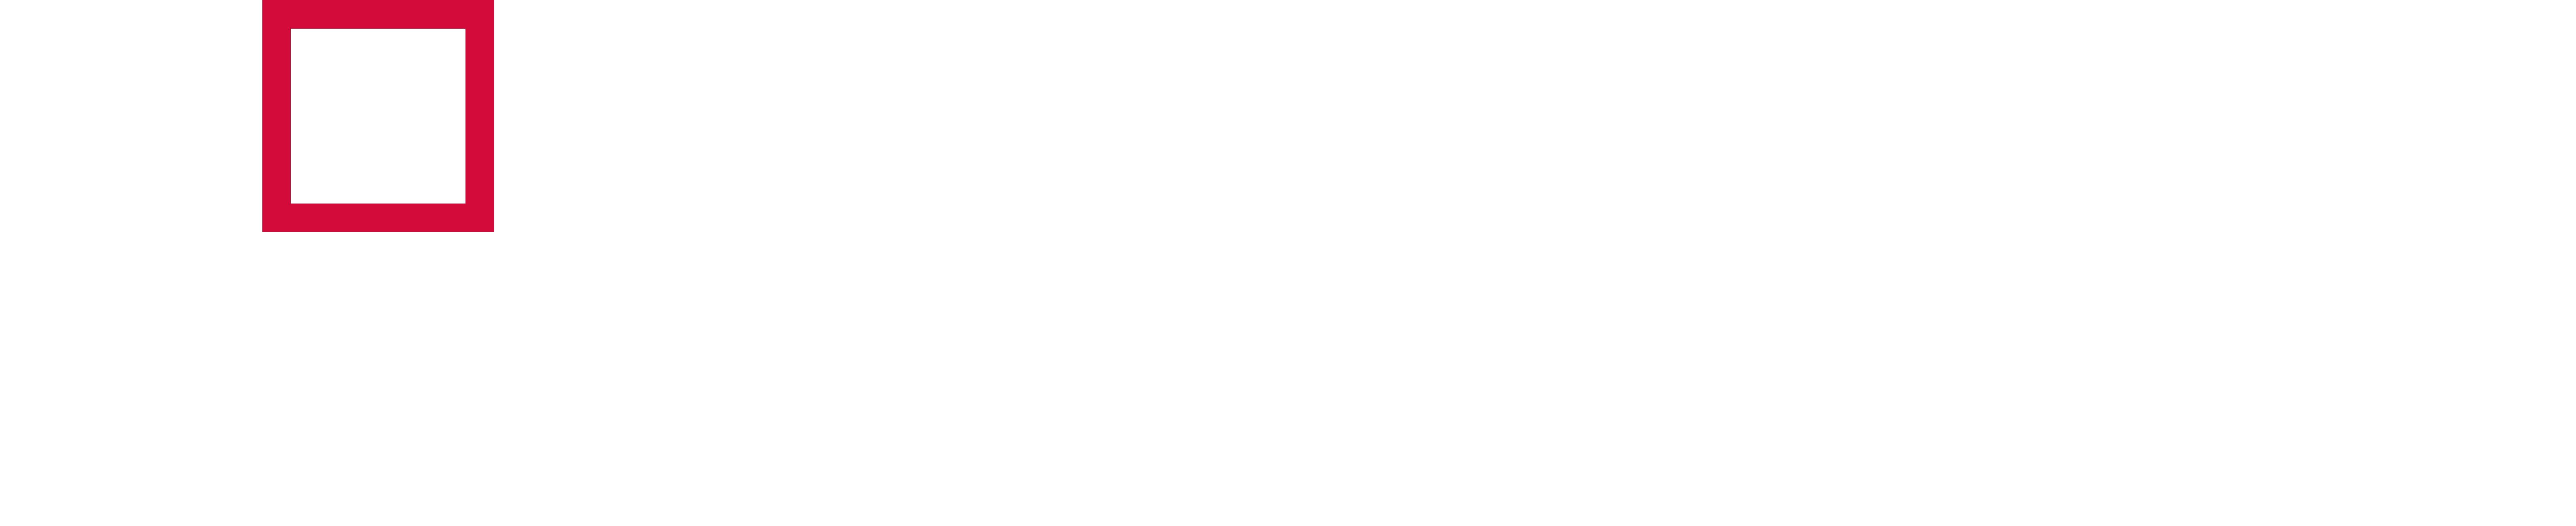 Friese